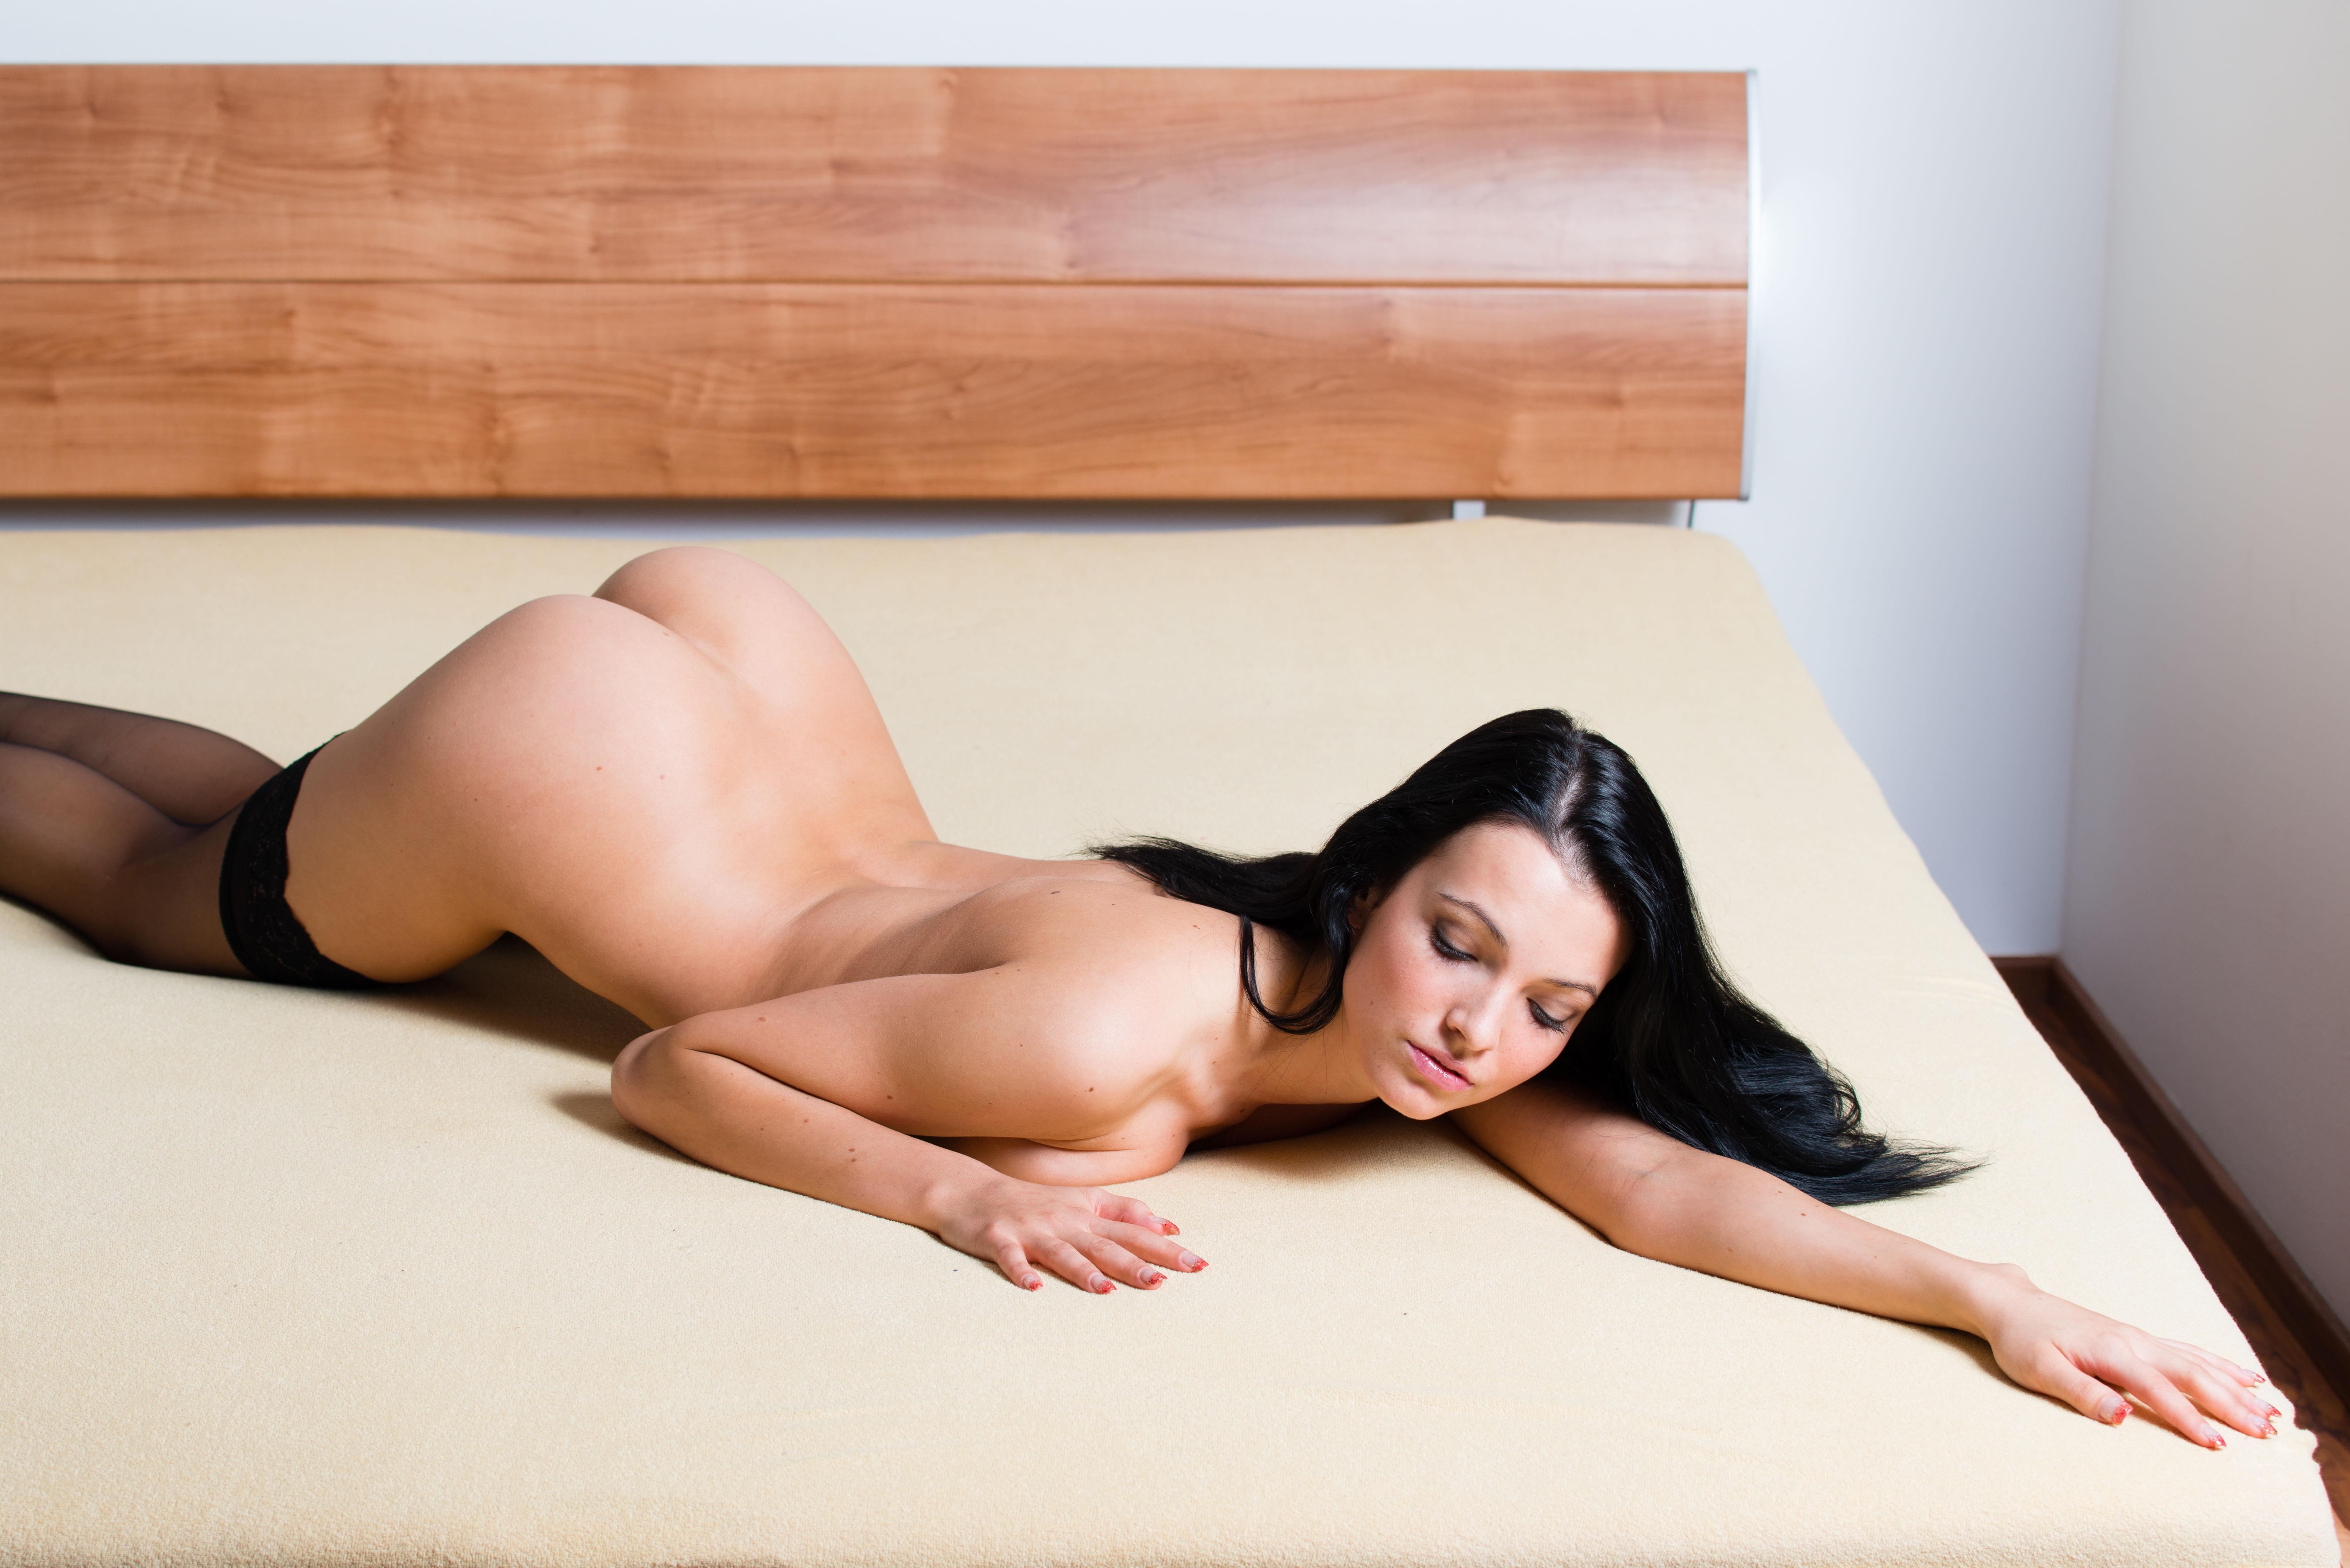 Sapphira girl sex, rebecca bailes naked